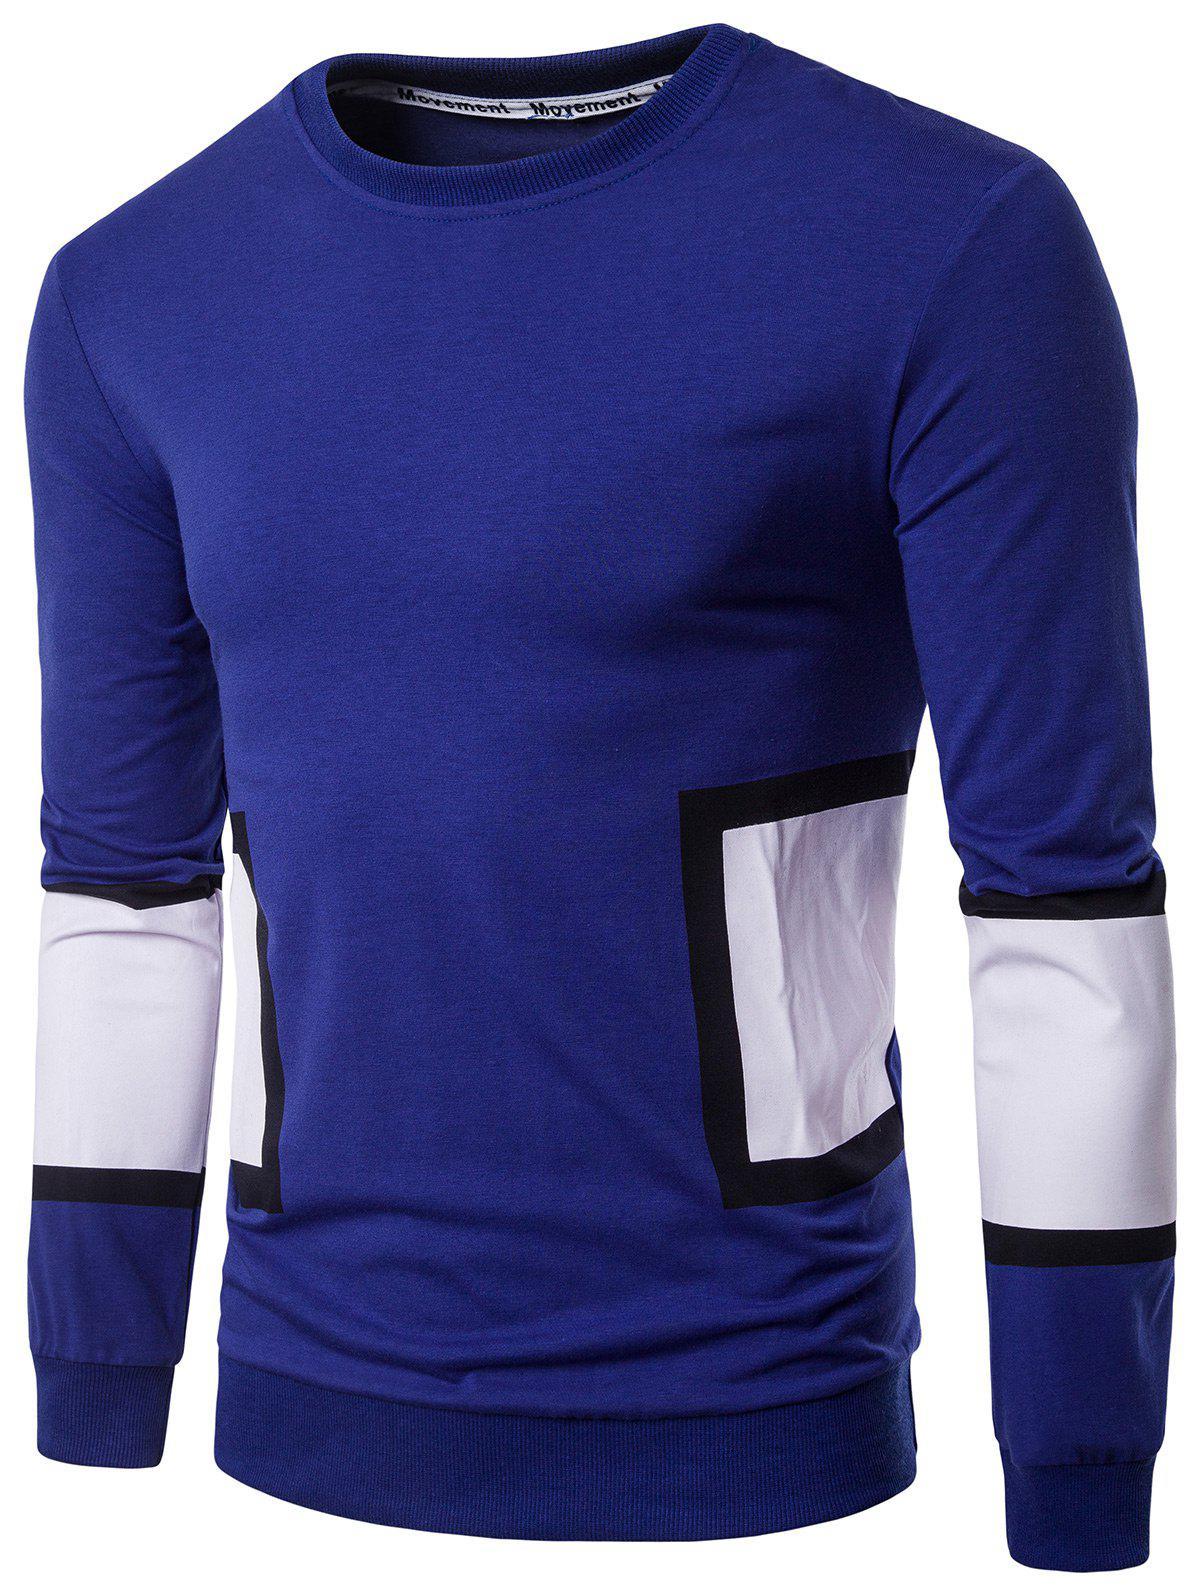 Crew Neck Color Block Panel Design Graphic Print T shirt 218913804